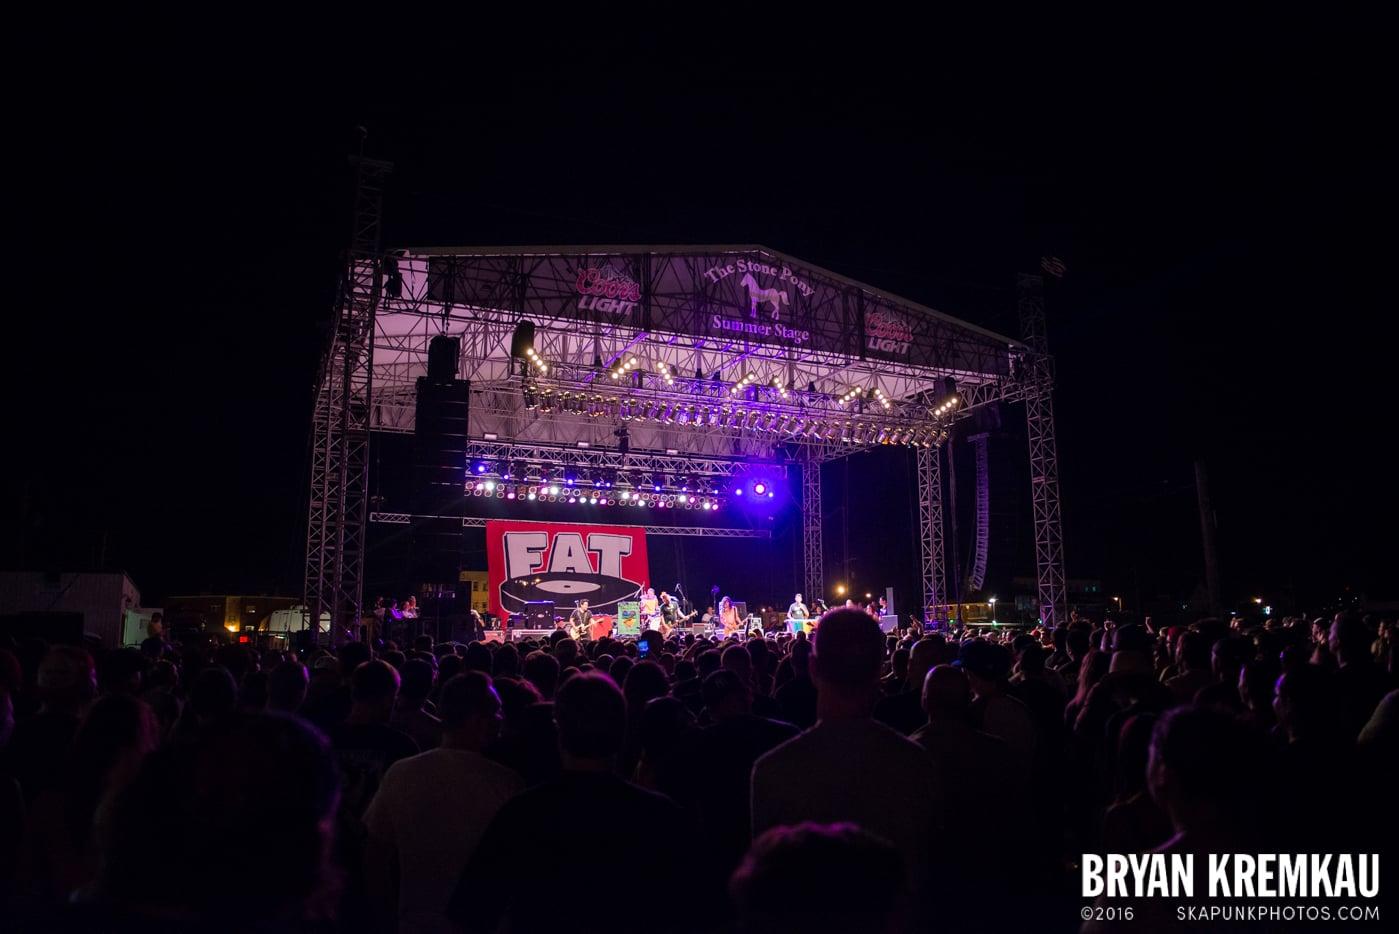 NOFX @ Stone Pony Summer Stage, Asbury Park, NJ - 8.15.15 (1)